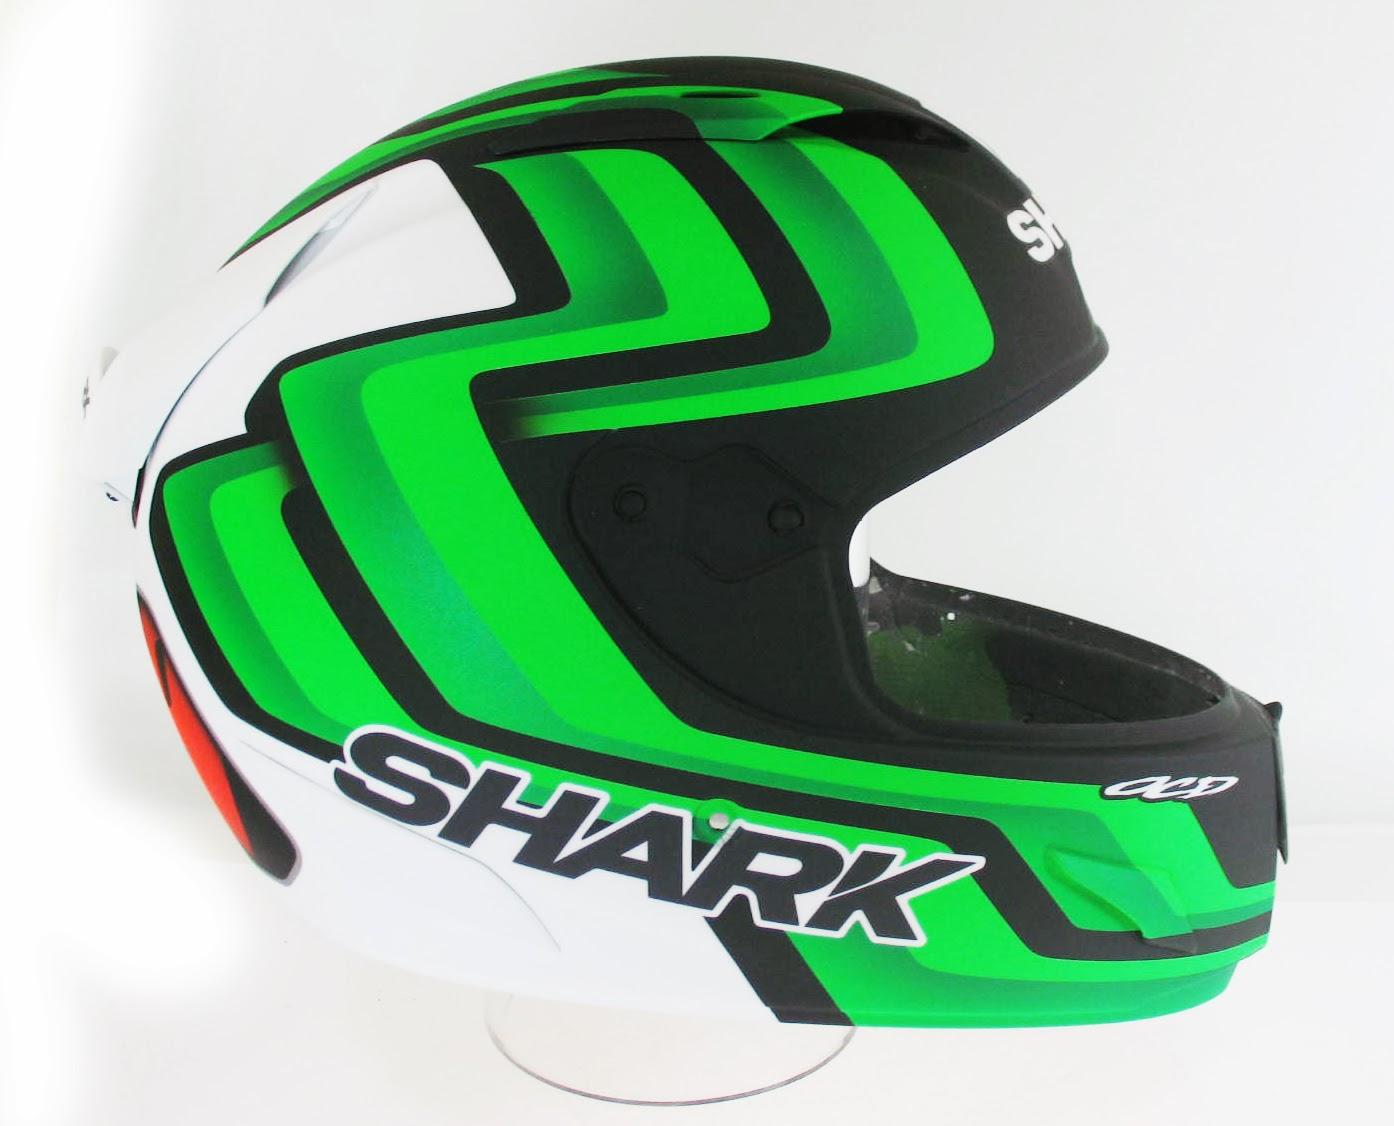 racing helmets garage shark race r pro f foret 2013 by ocd. Black Bedroom Furniture Sets. Home Design Ideas